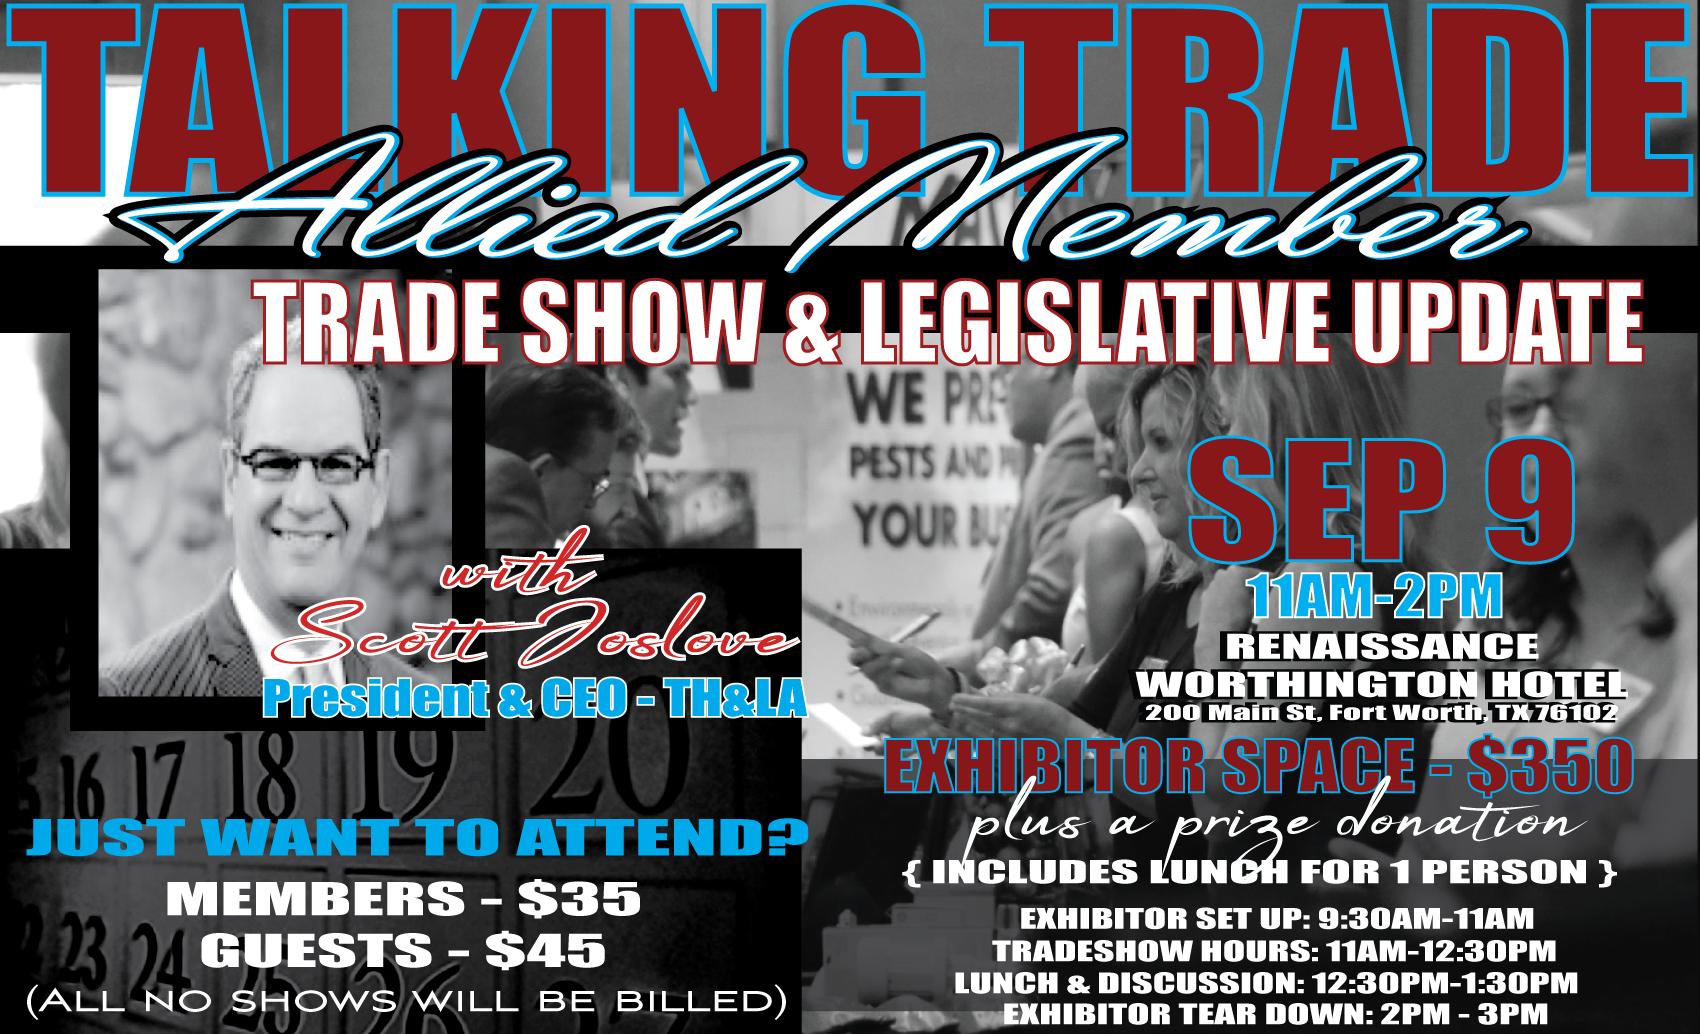 September Legislative Update & Tradeshow